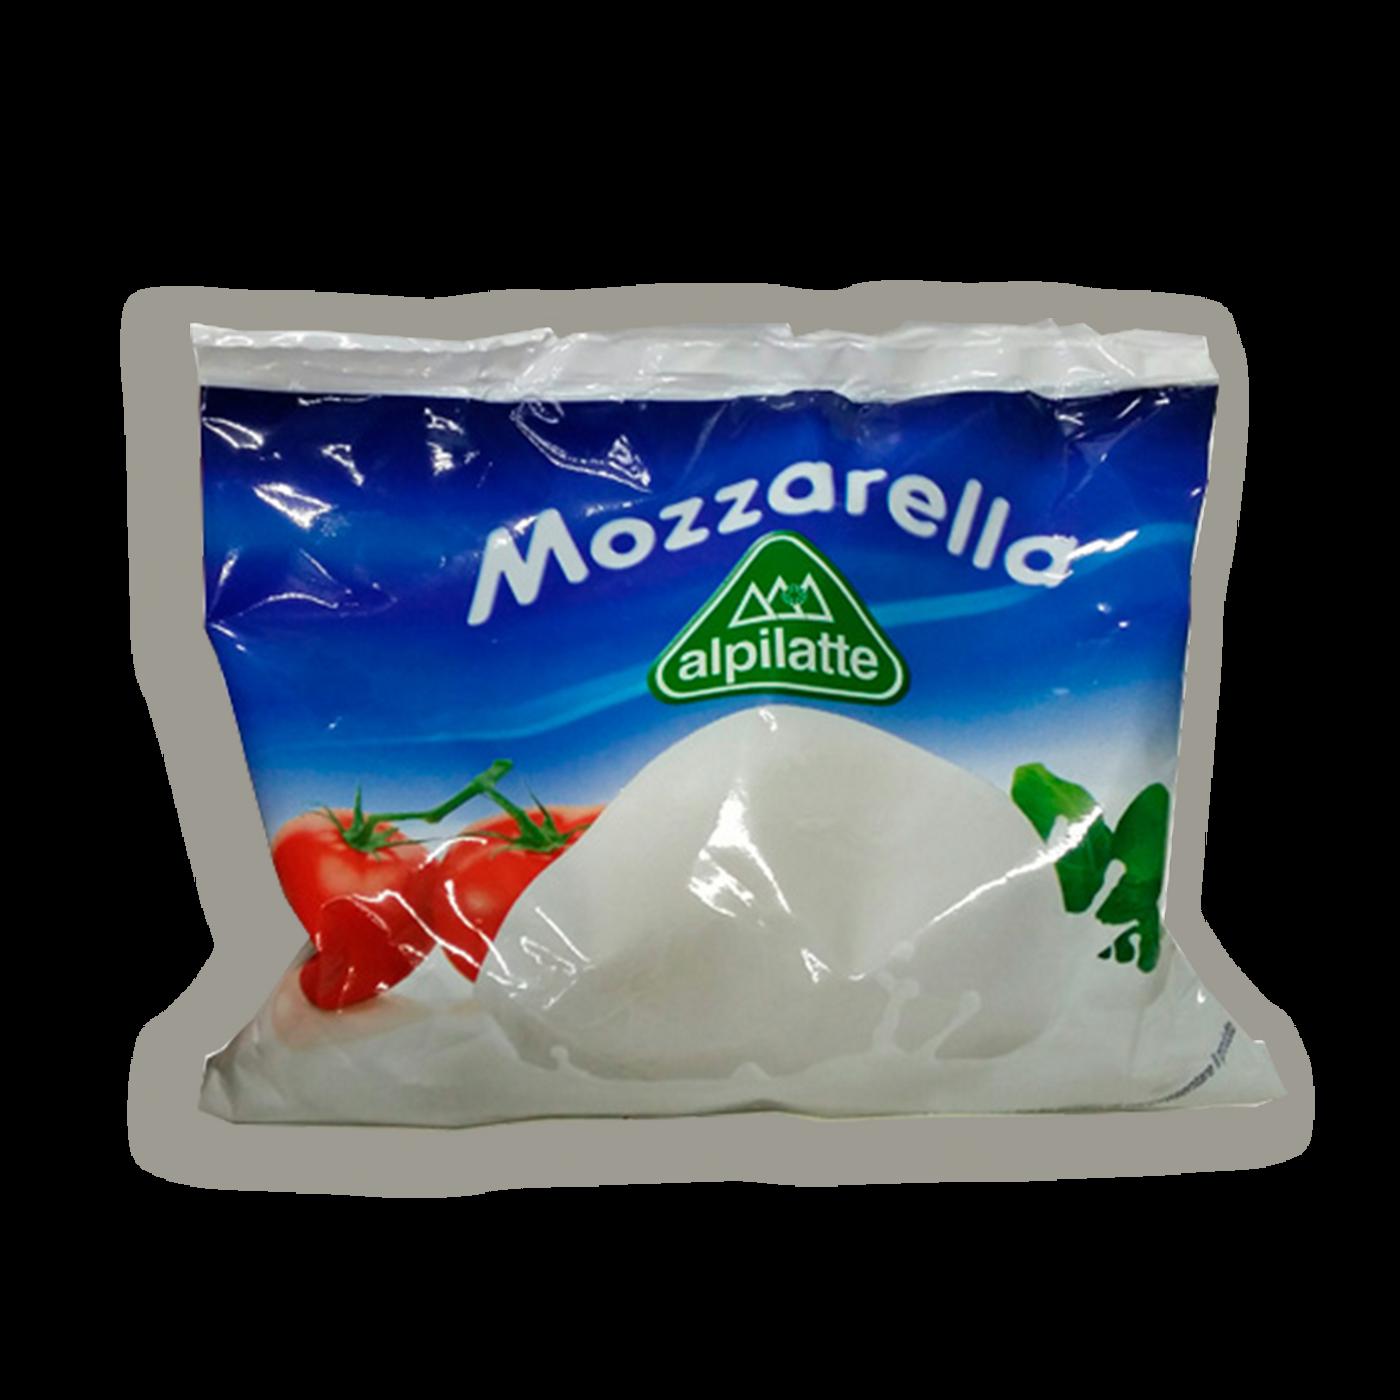 Mozzarella Alpilate Busta